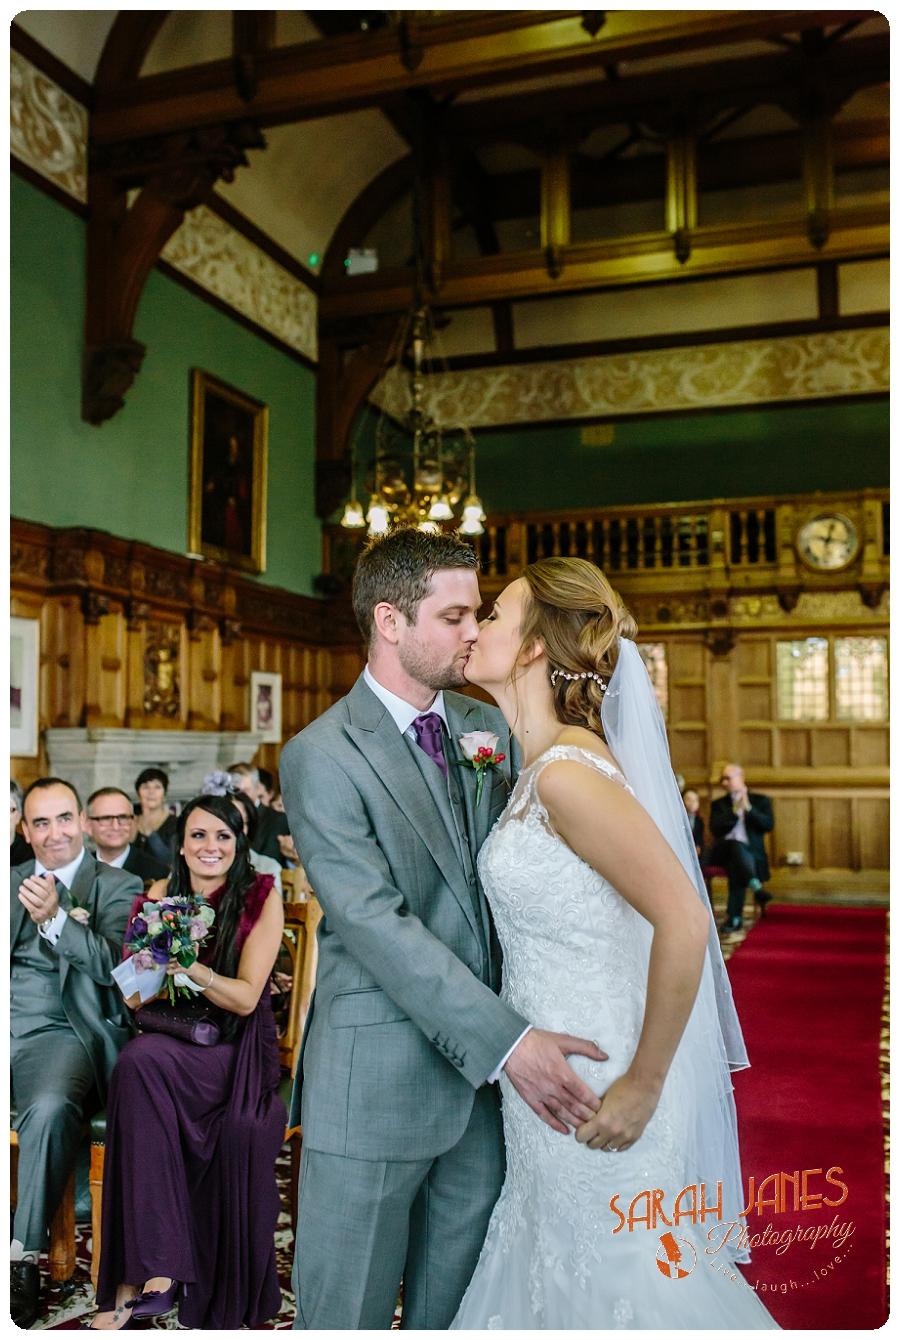 Wedding photography Chester, Weddings Rowton Hall, Wedding photography at Rowton Hall, Sarah Janes Photograpphy_0016.jpg